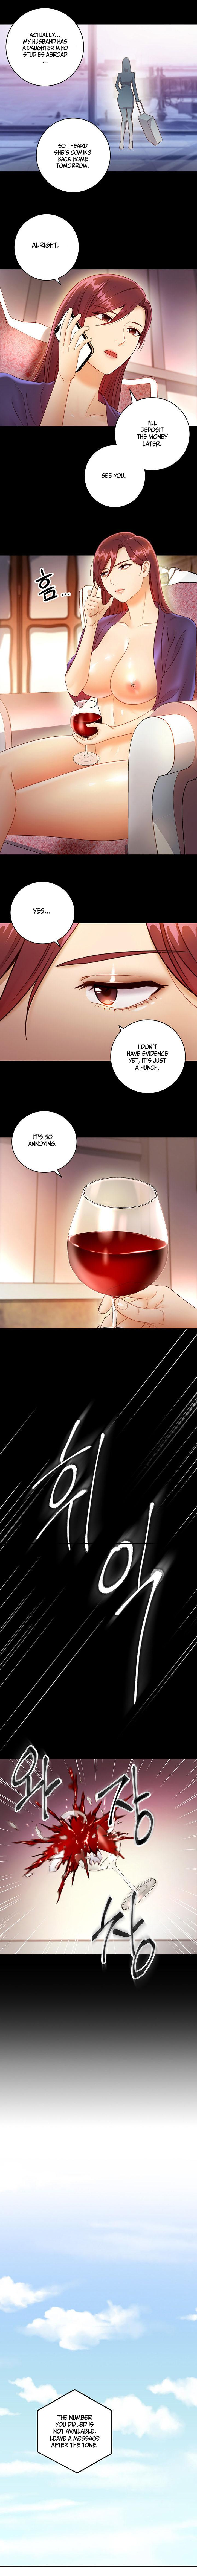 [Neck Pilllow] Stepmother Friends Ch.40/? [English] [Hentai Universe] NEW! 22/10/2020 367